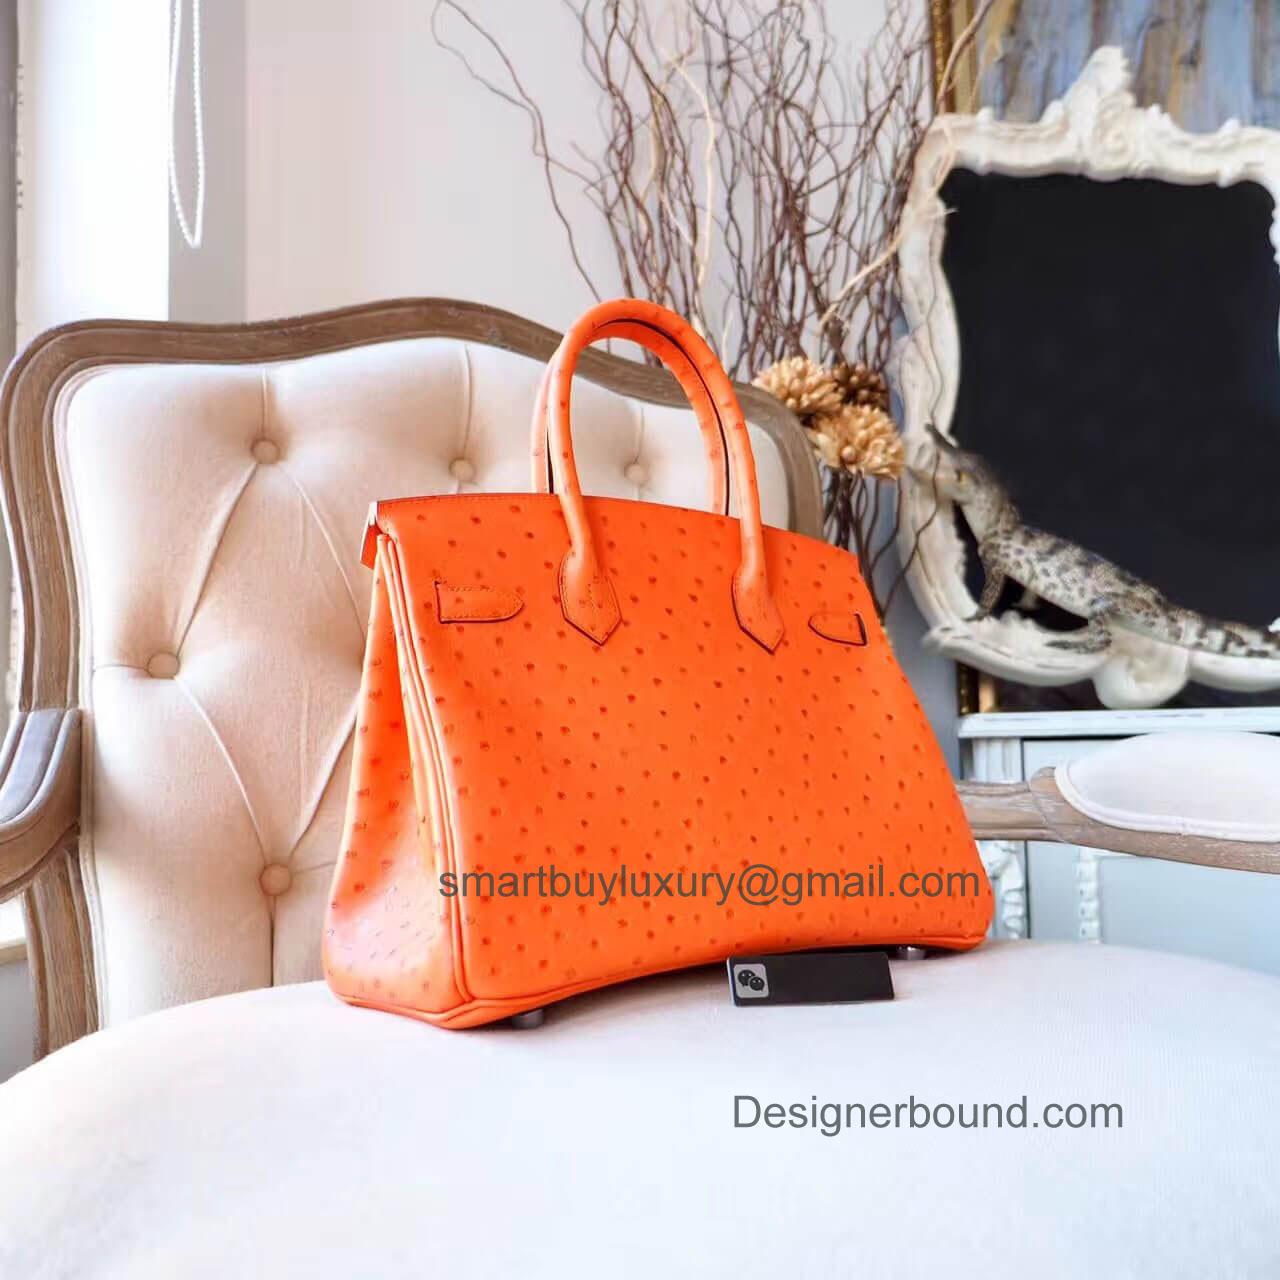 854bc3f293db Hermes Birkin 30 Handbag in ck93 Orange Ostrich PHW - Hermes Replica